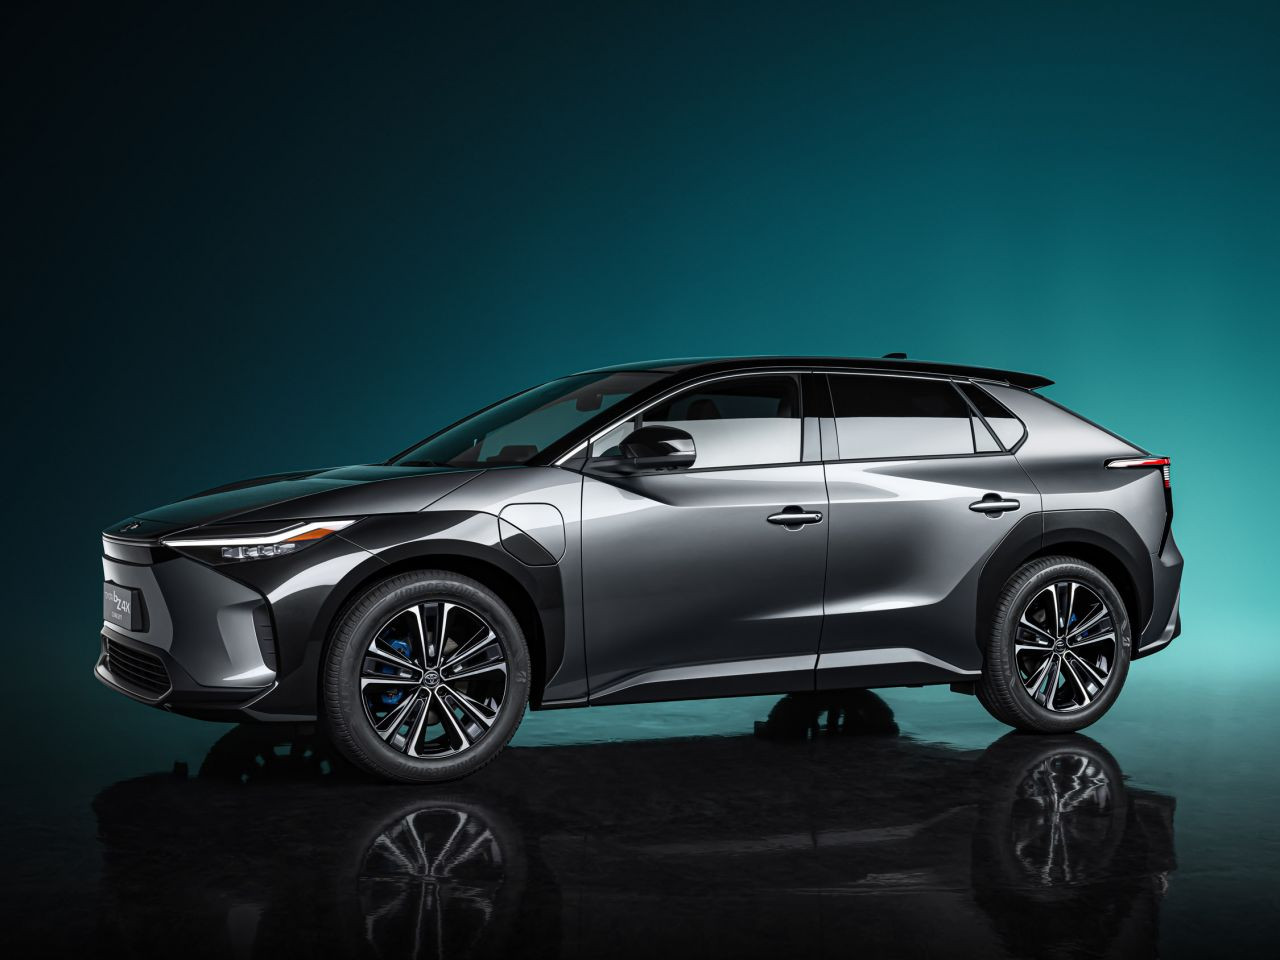 Toyota bZ4X ile yüzde 100 elektrikli otomobil pazarına giriyor - Page 2